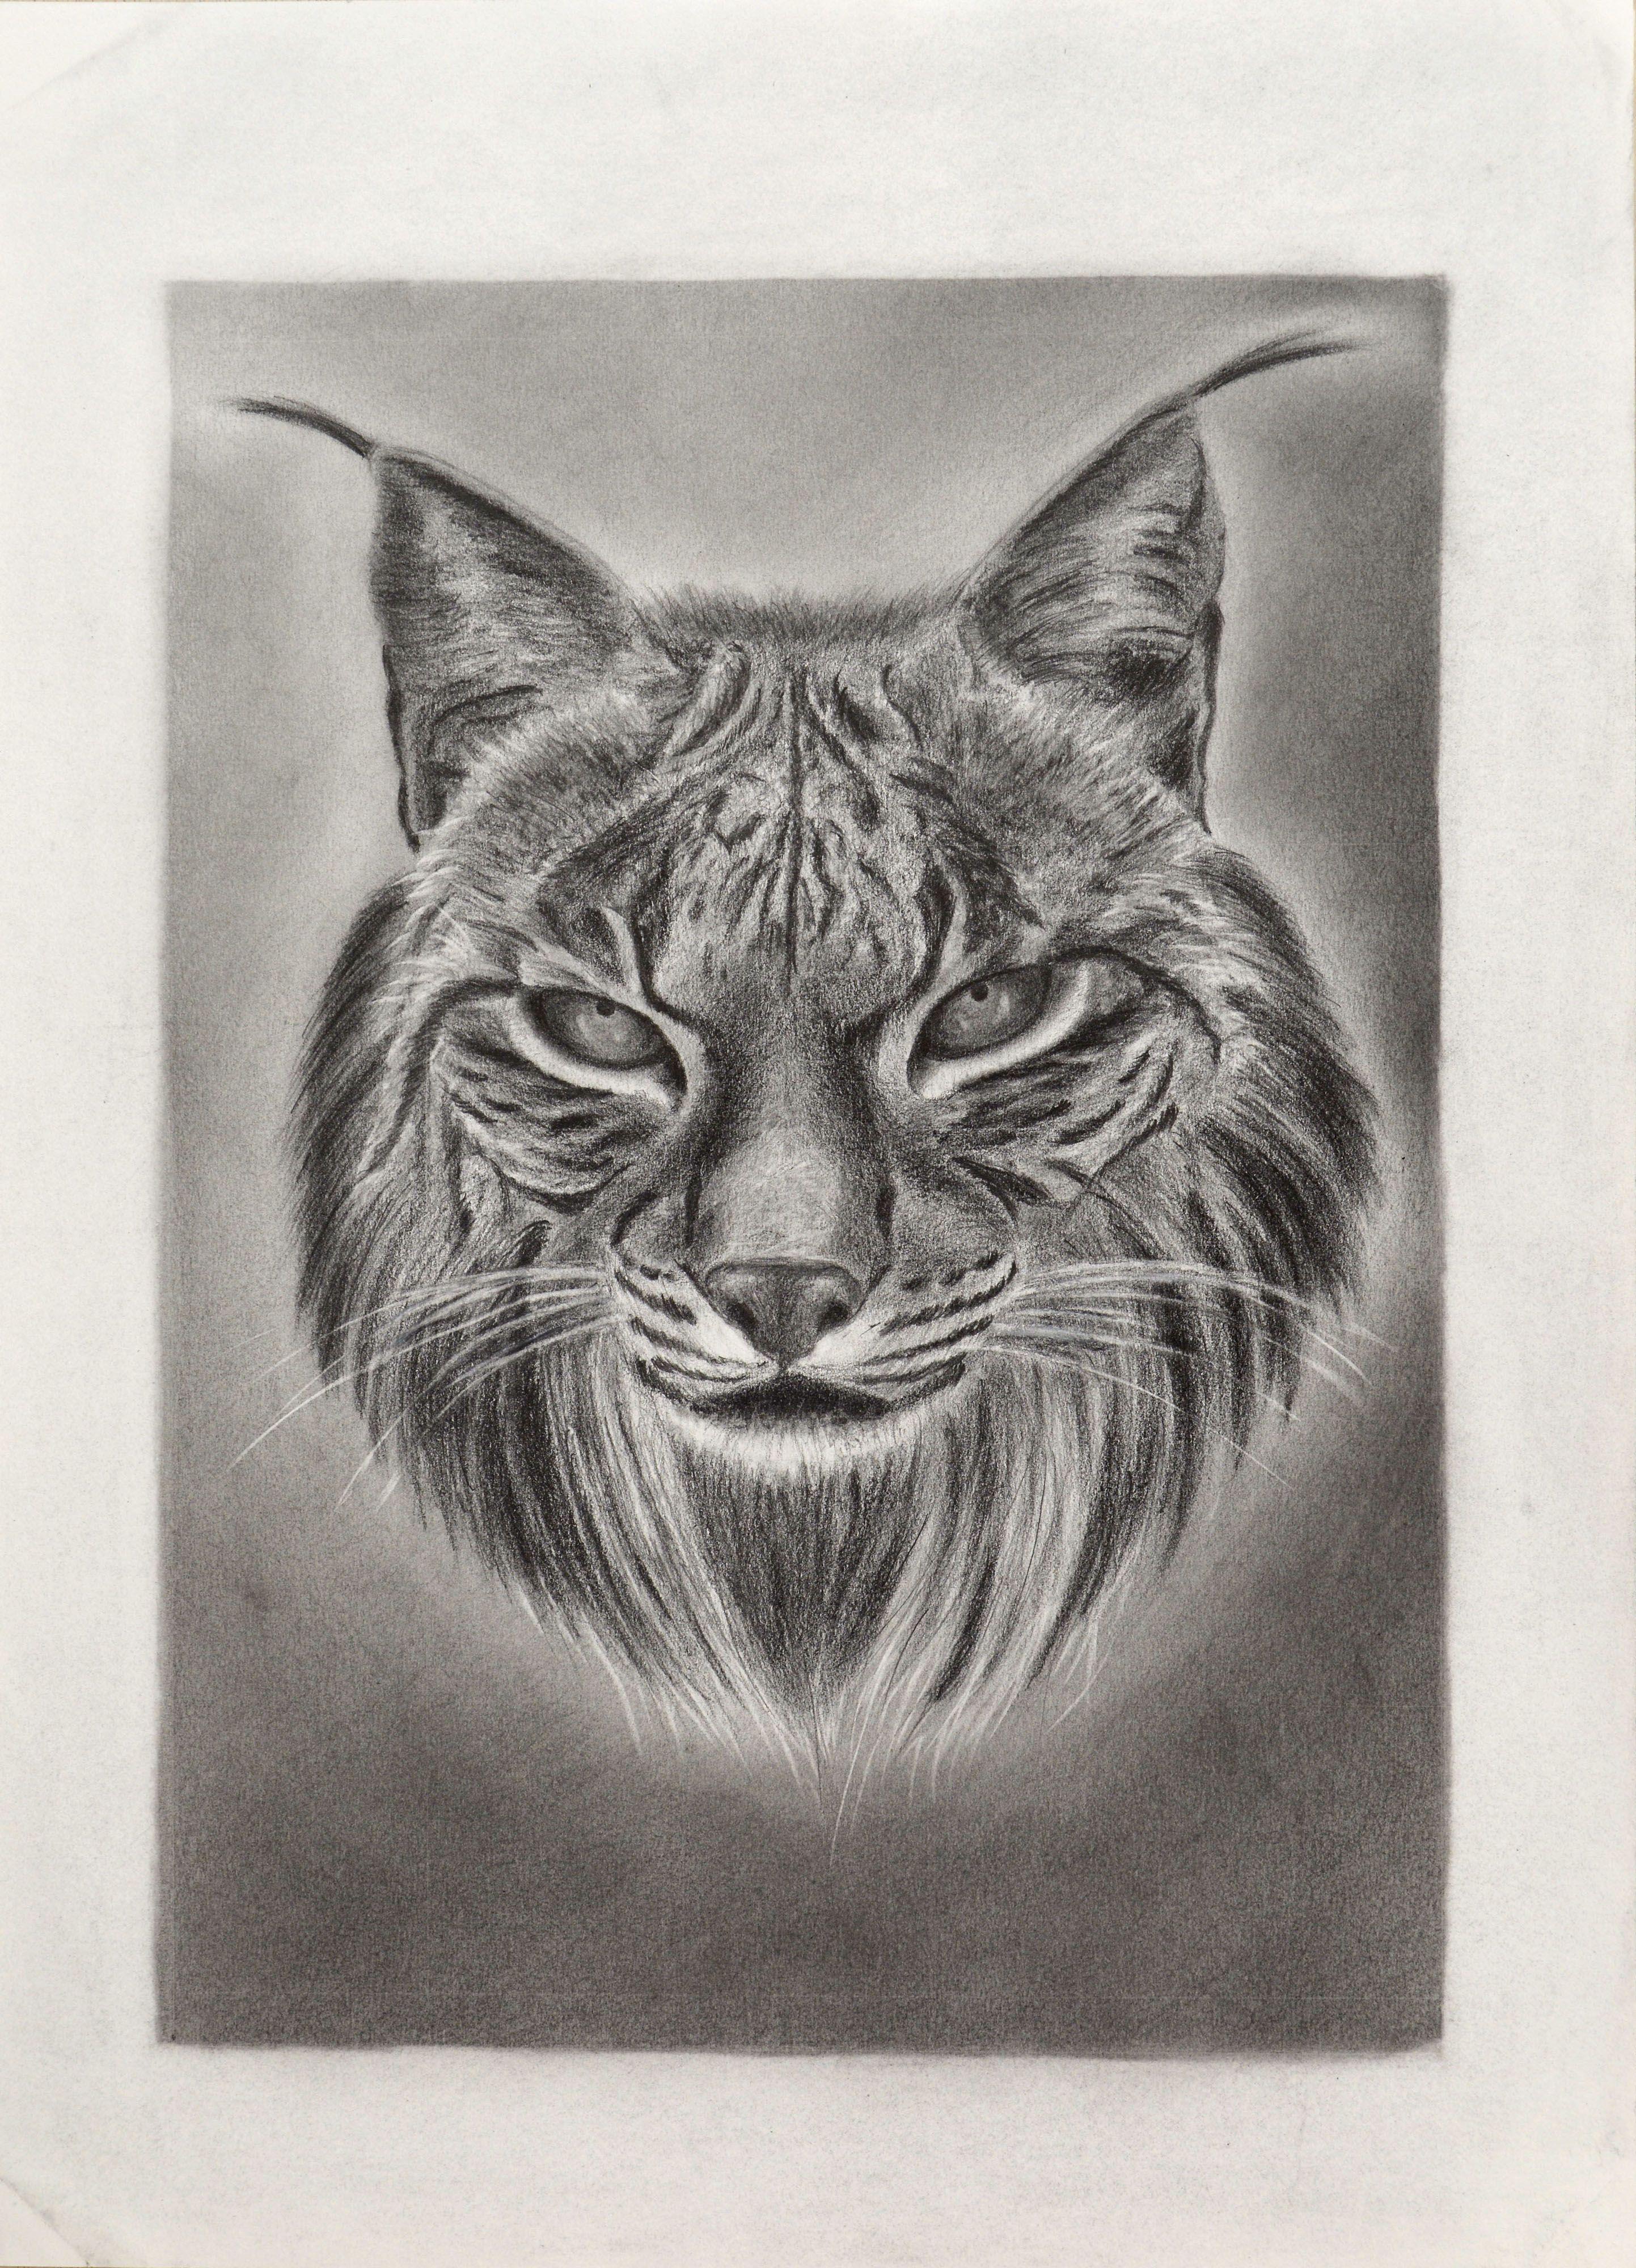 Lince ibérico iberian lynx 06 2015